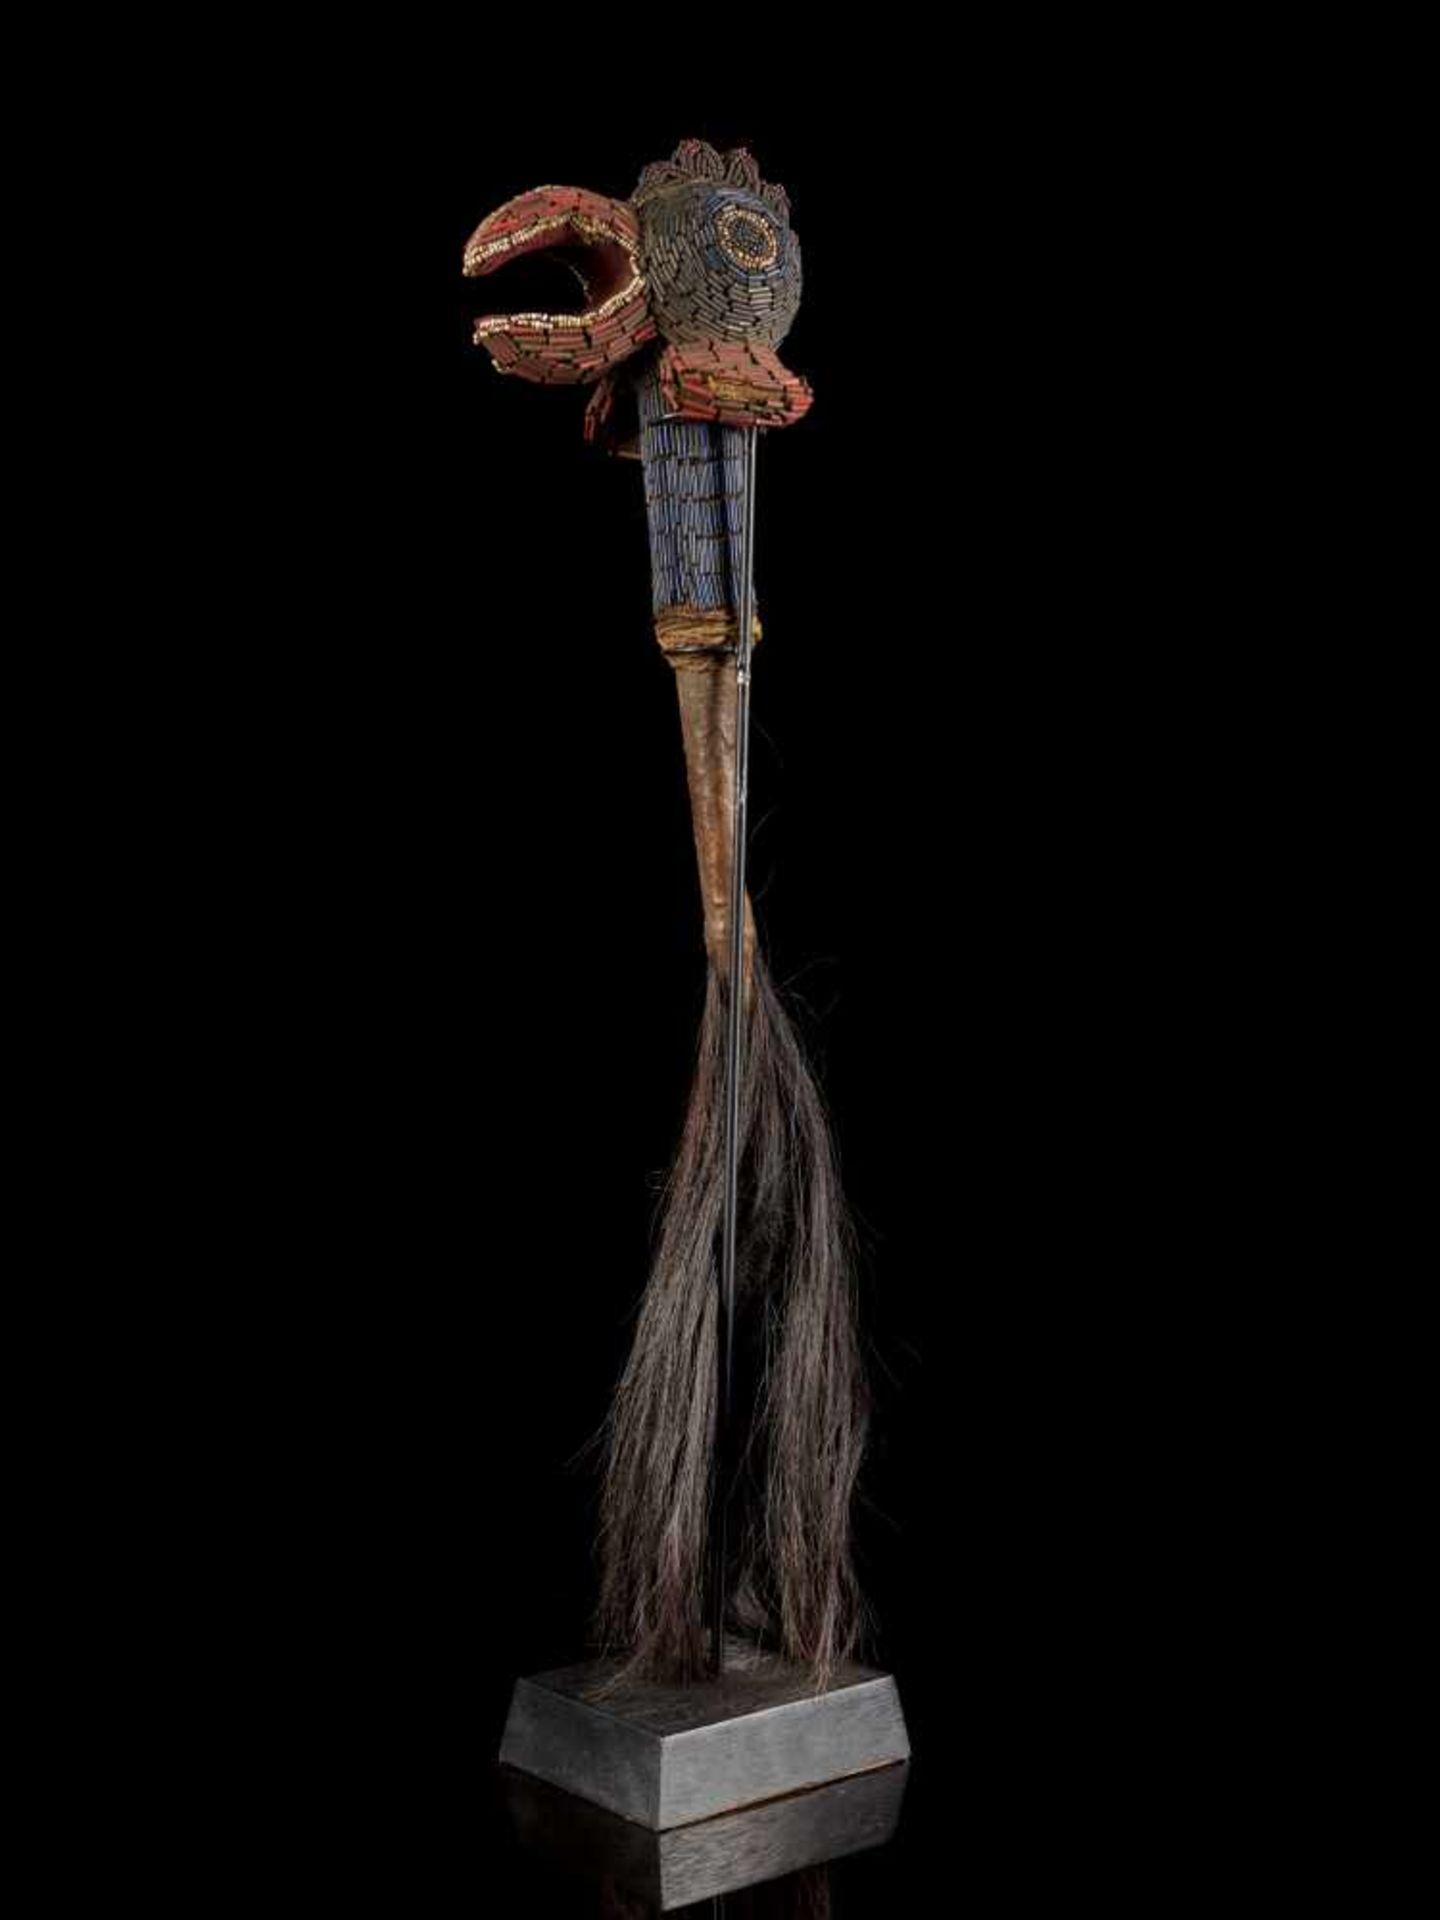 Beaded Flywhisk - Rooster - Tribal ArtThe Royal Fly Whisks (ethnic names: see leng koko or beuka) - Bild 3 aus 8